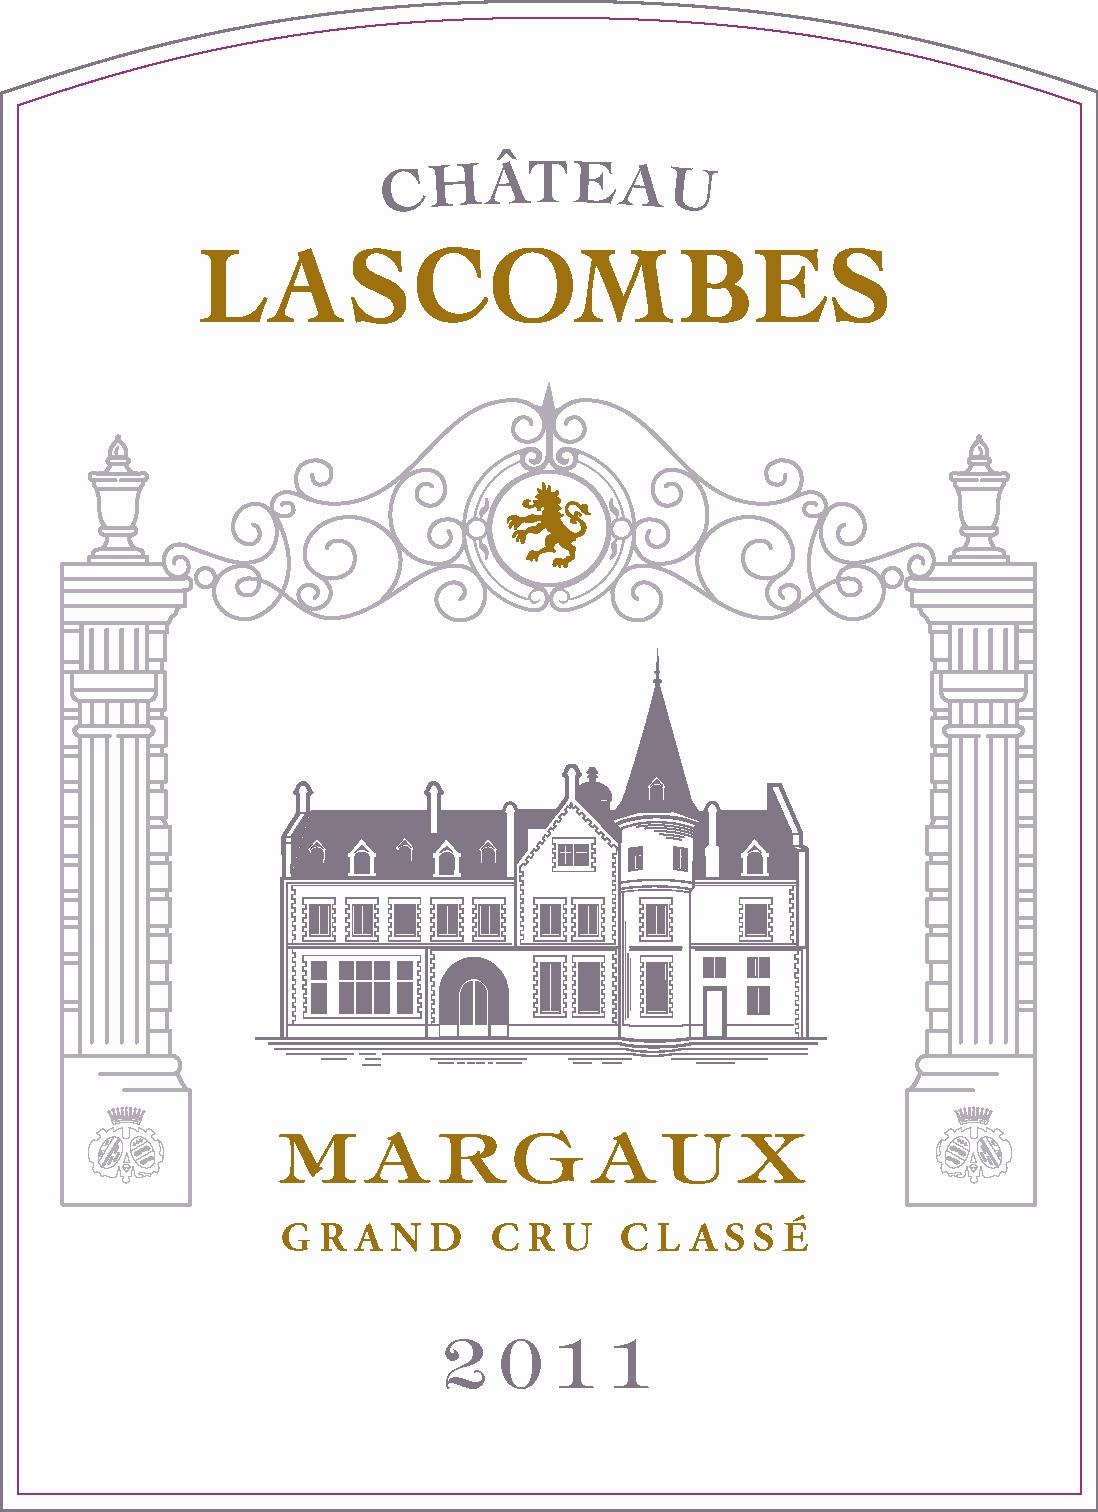 力士金酒庄干红Chateau Lascombes